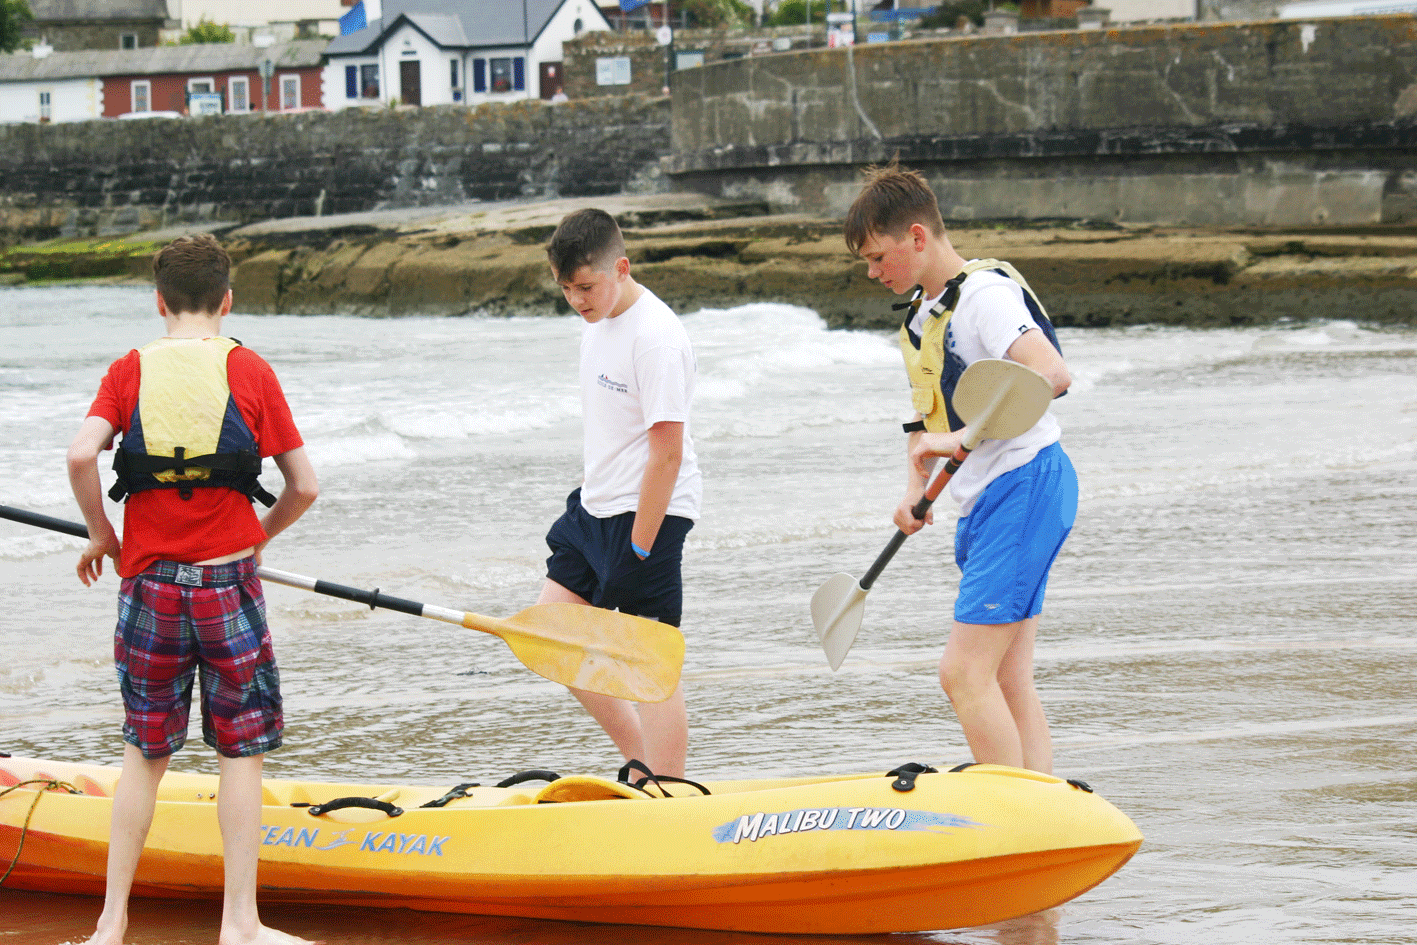 Kayaking ardmore ecole de mer 2016